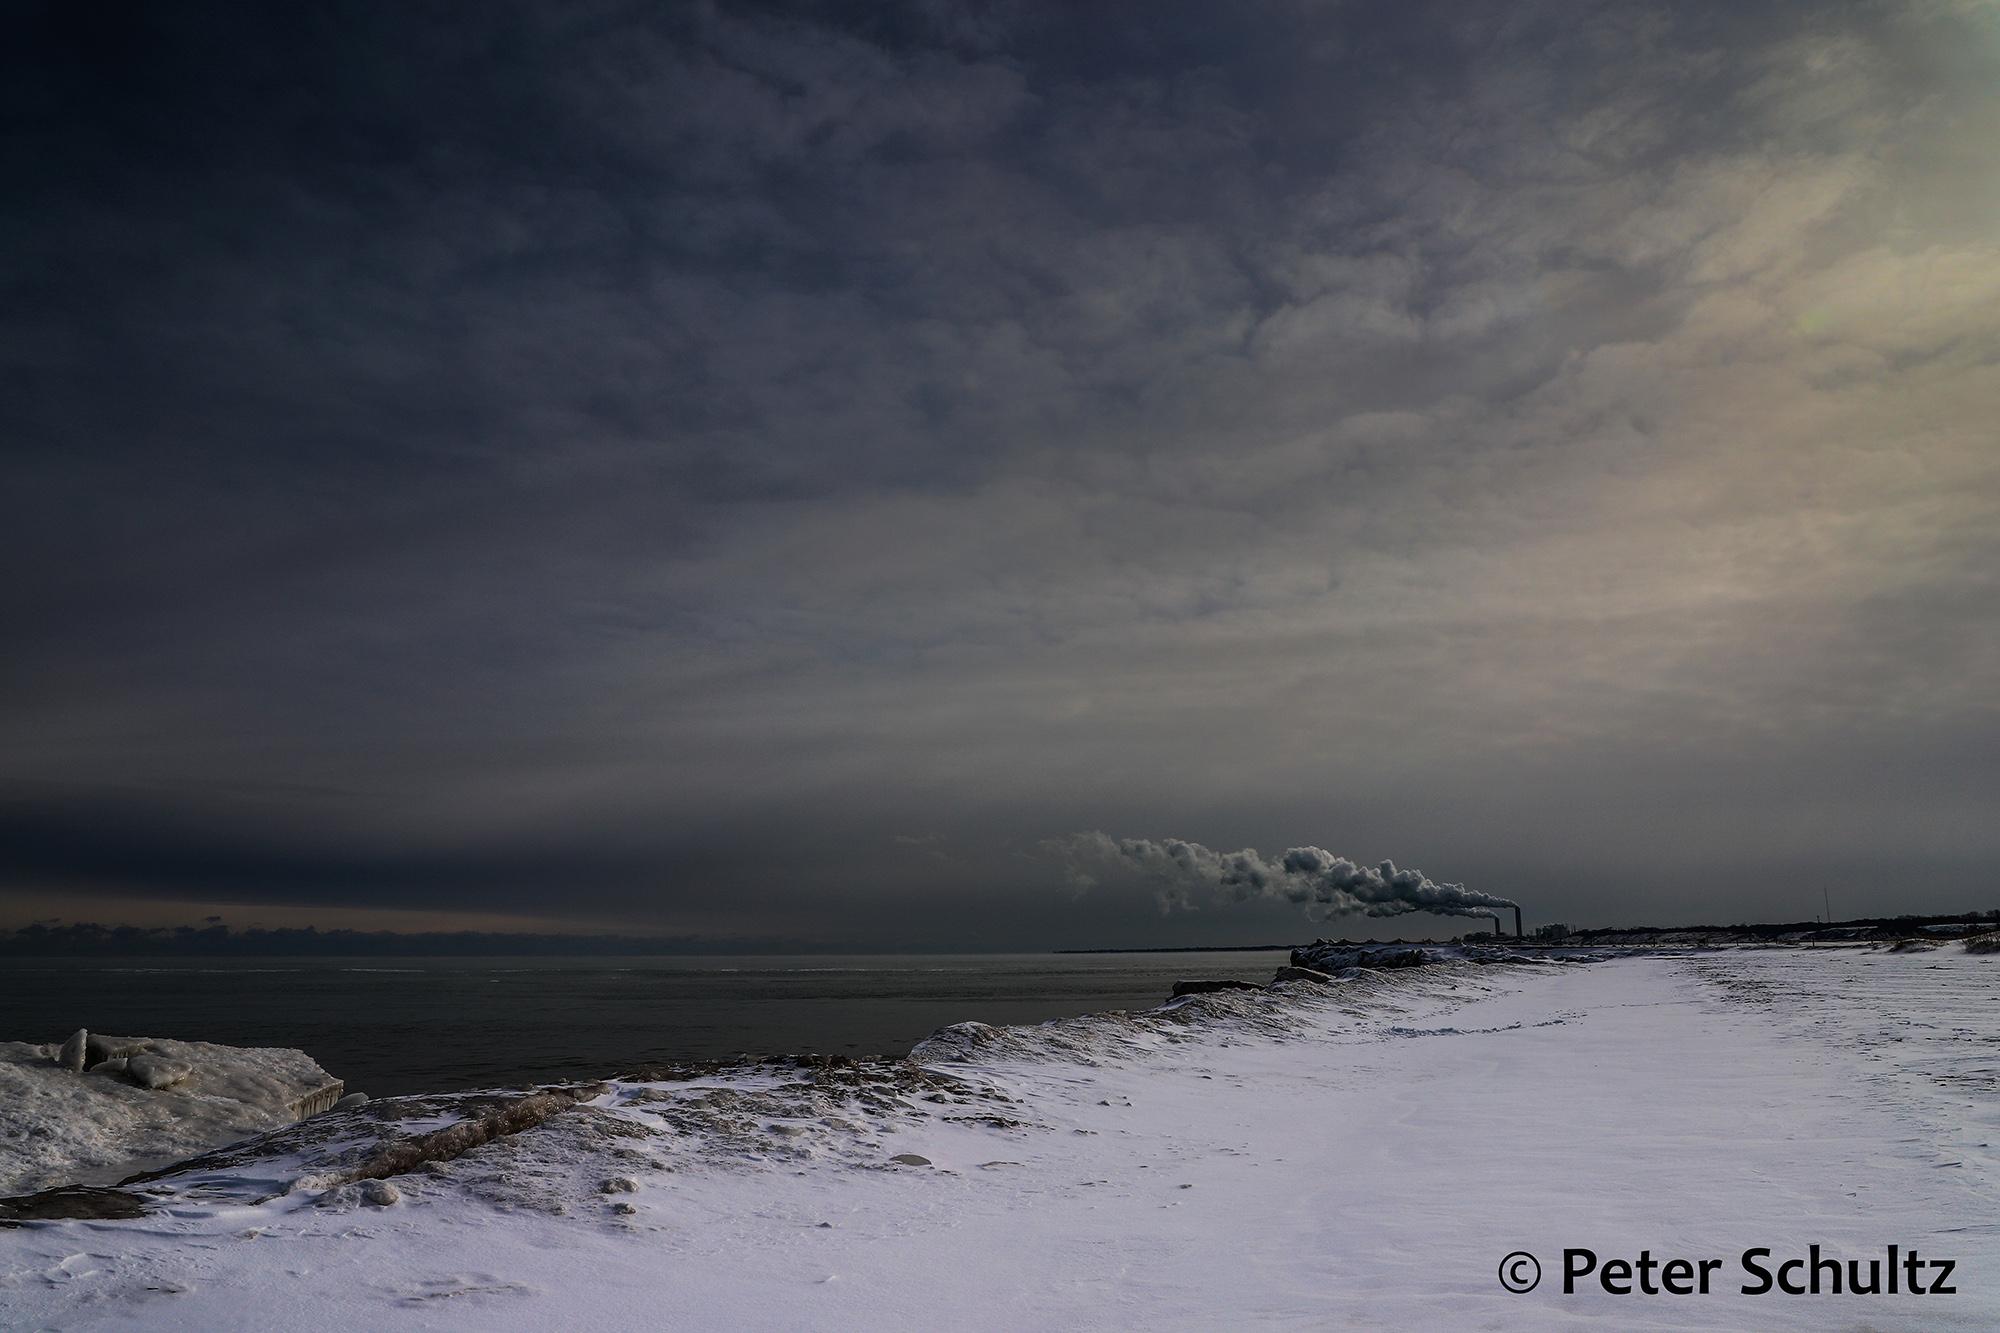 See My Breath - Peter Schultz - Grant Park